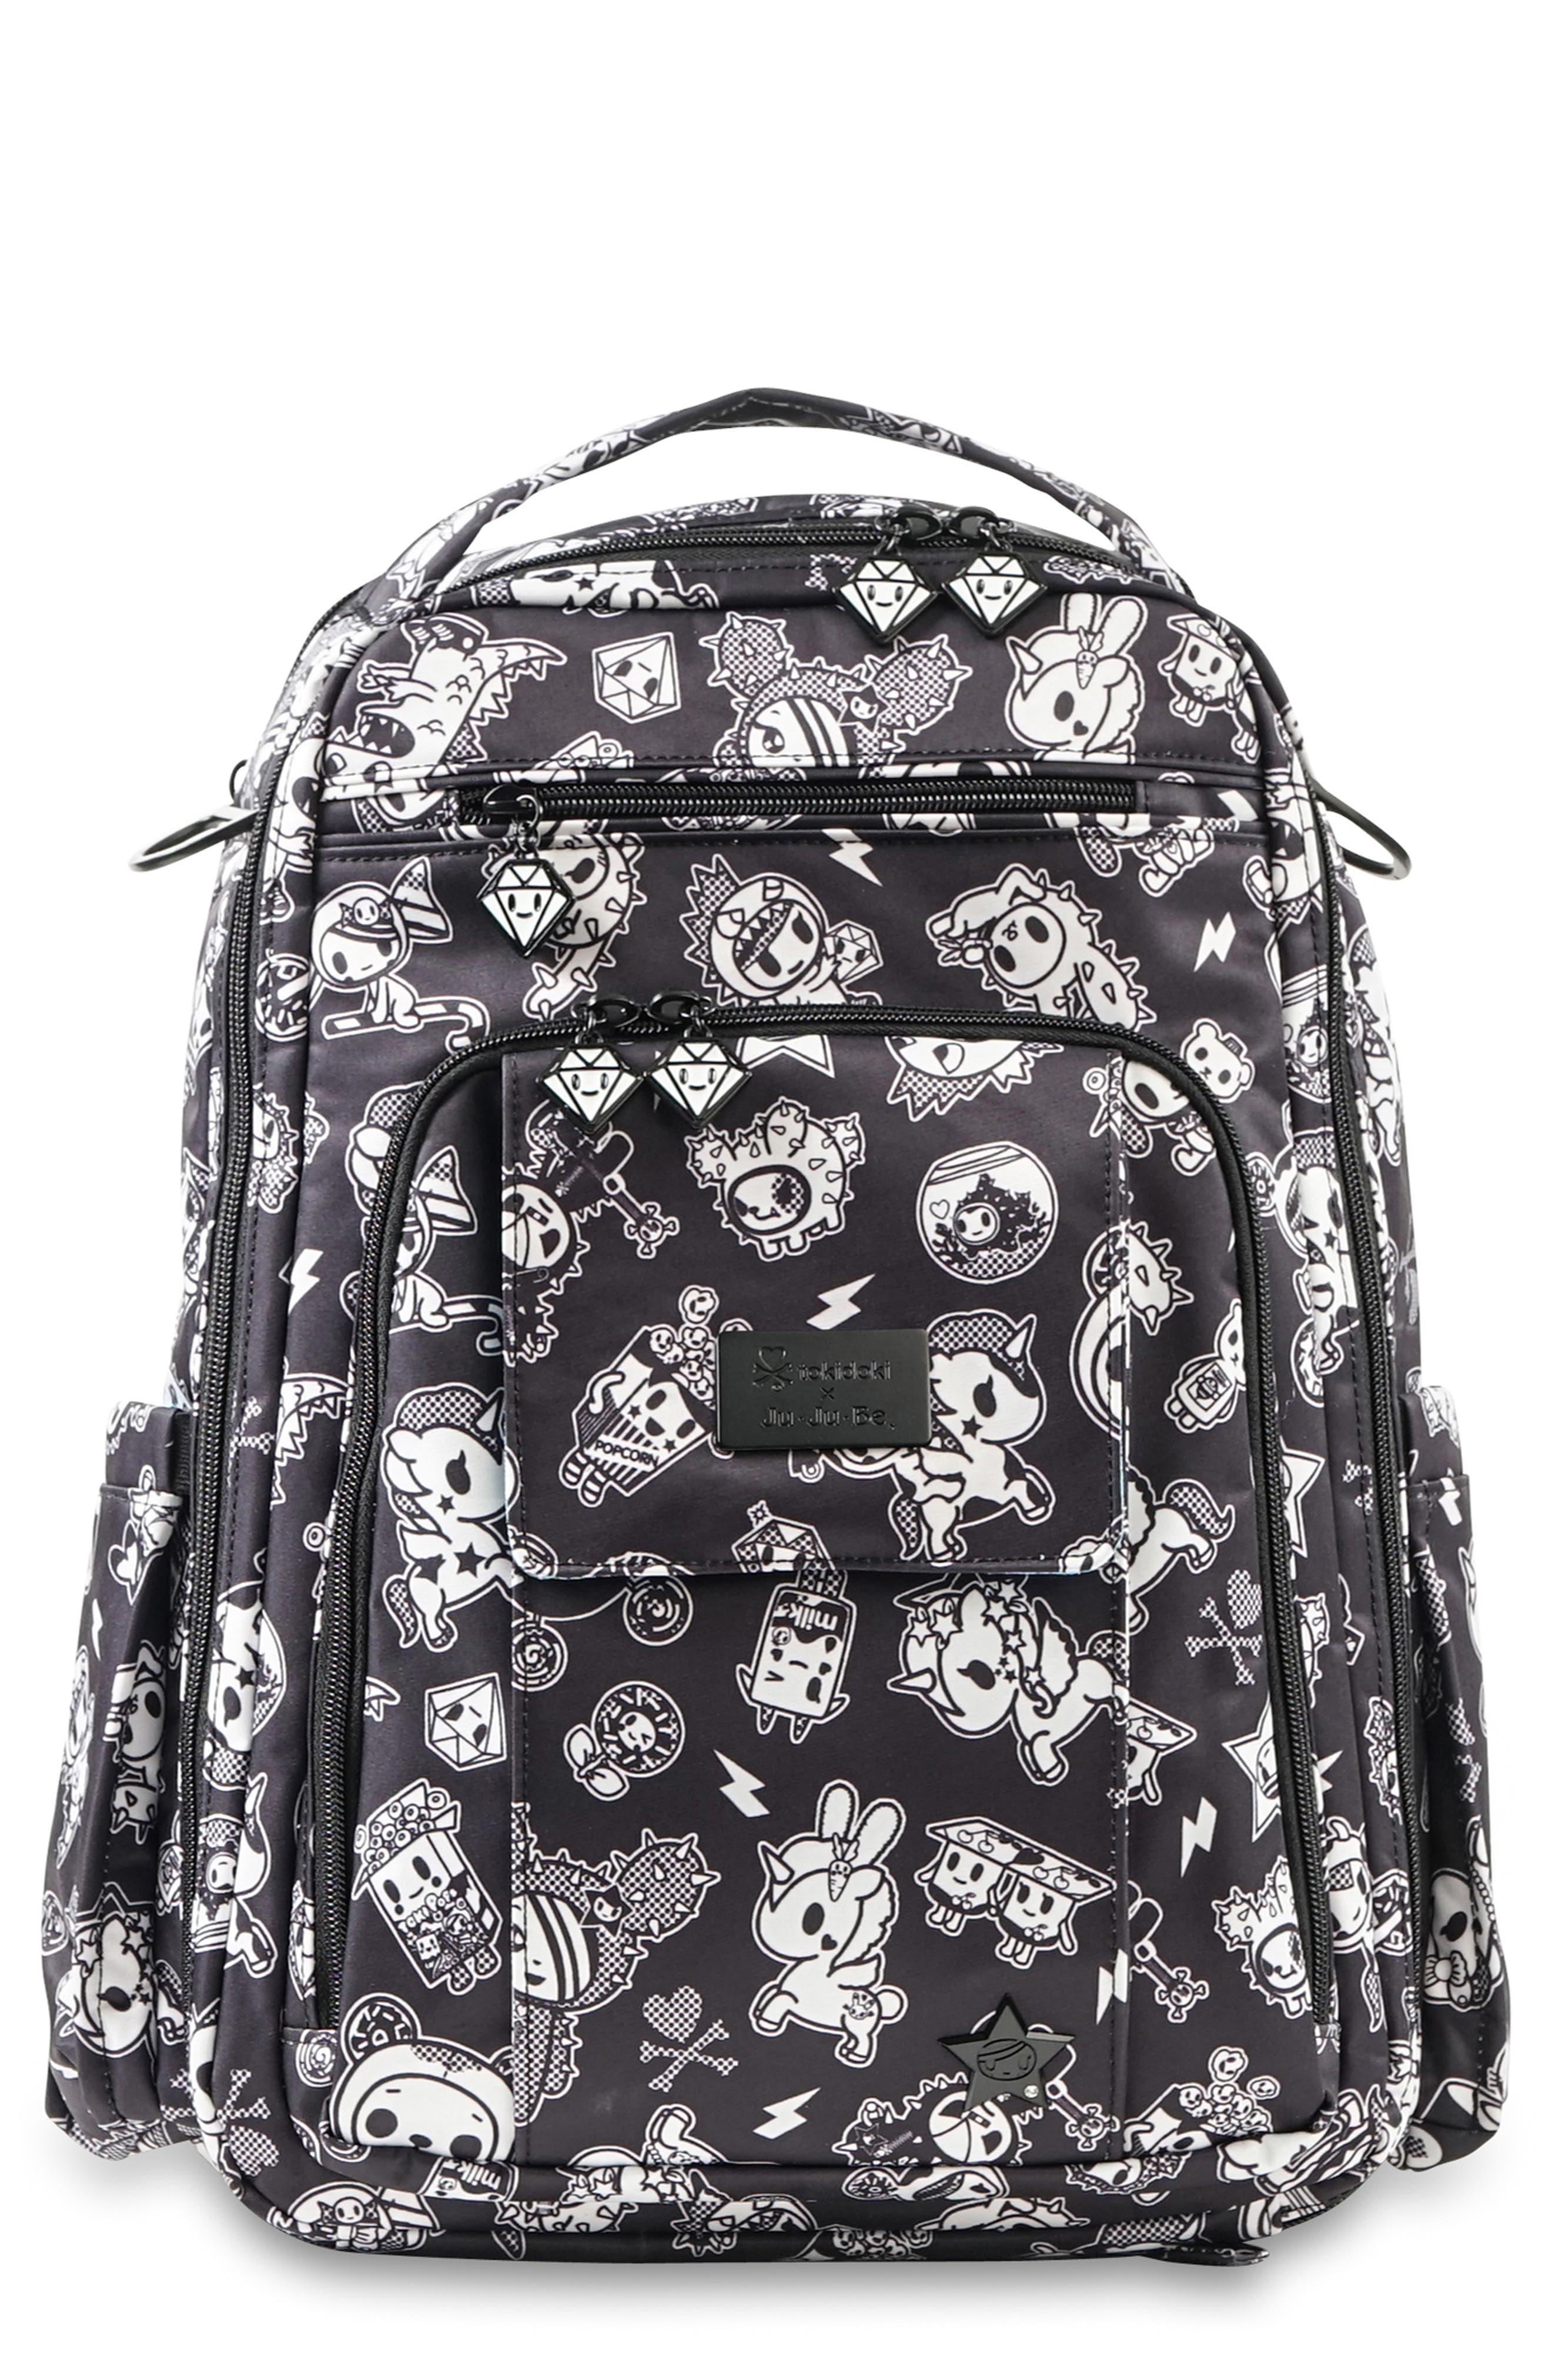 Infant Tokidoki X JuJuBe Be Right Back Diaper Backpack  Black